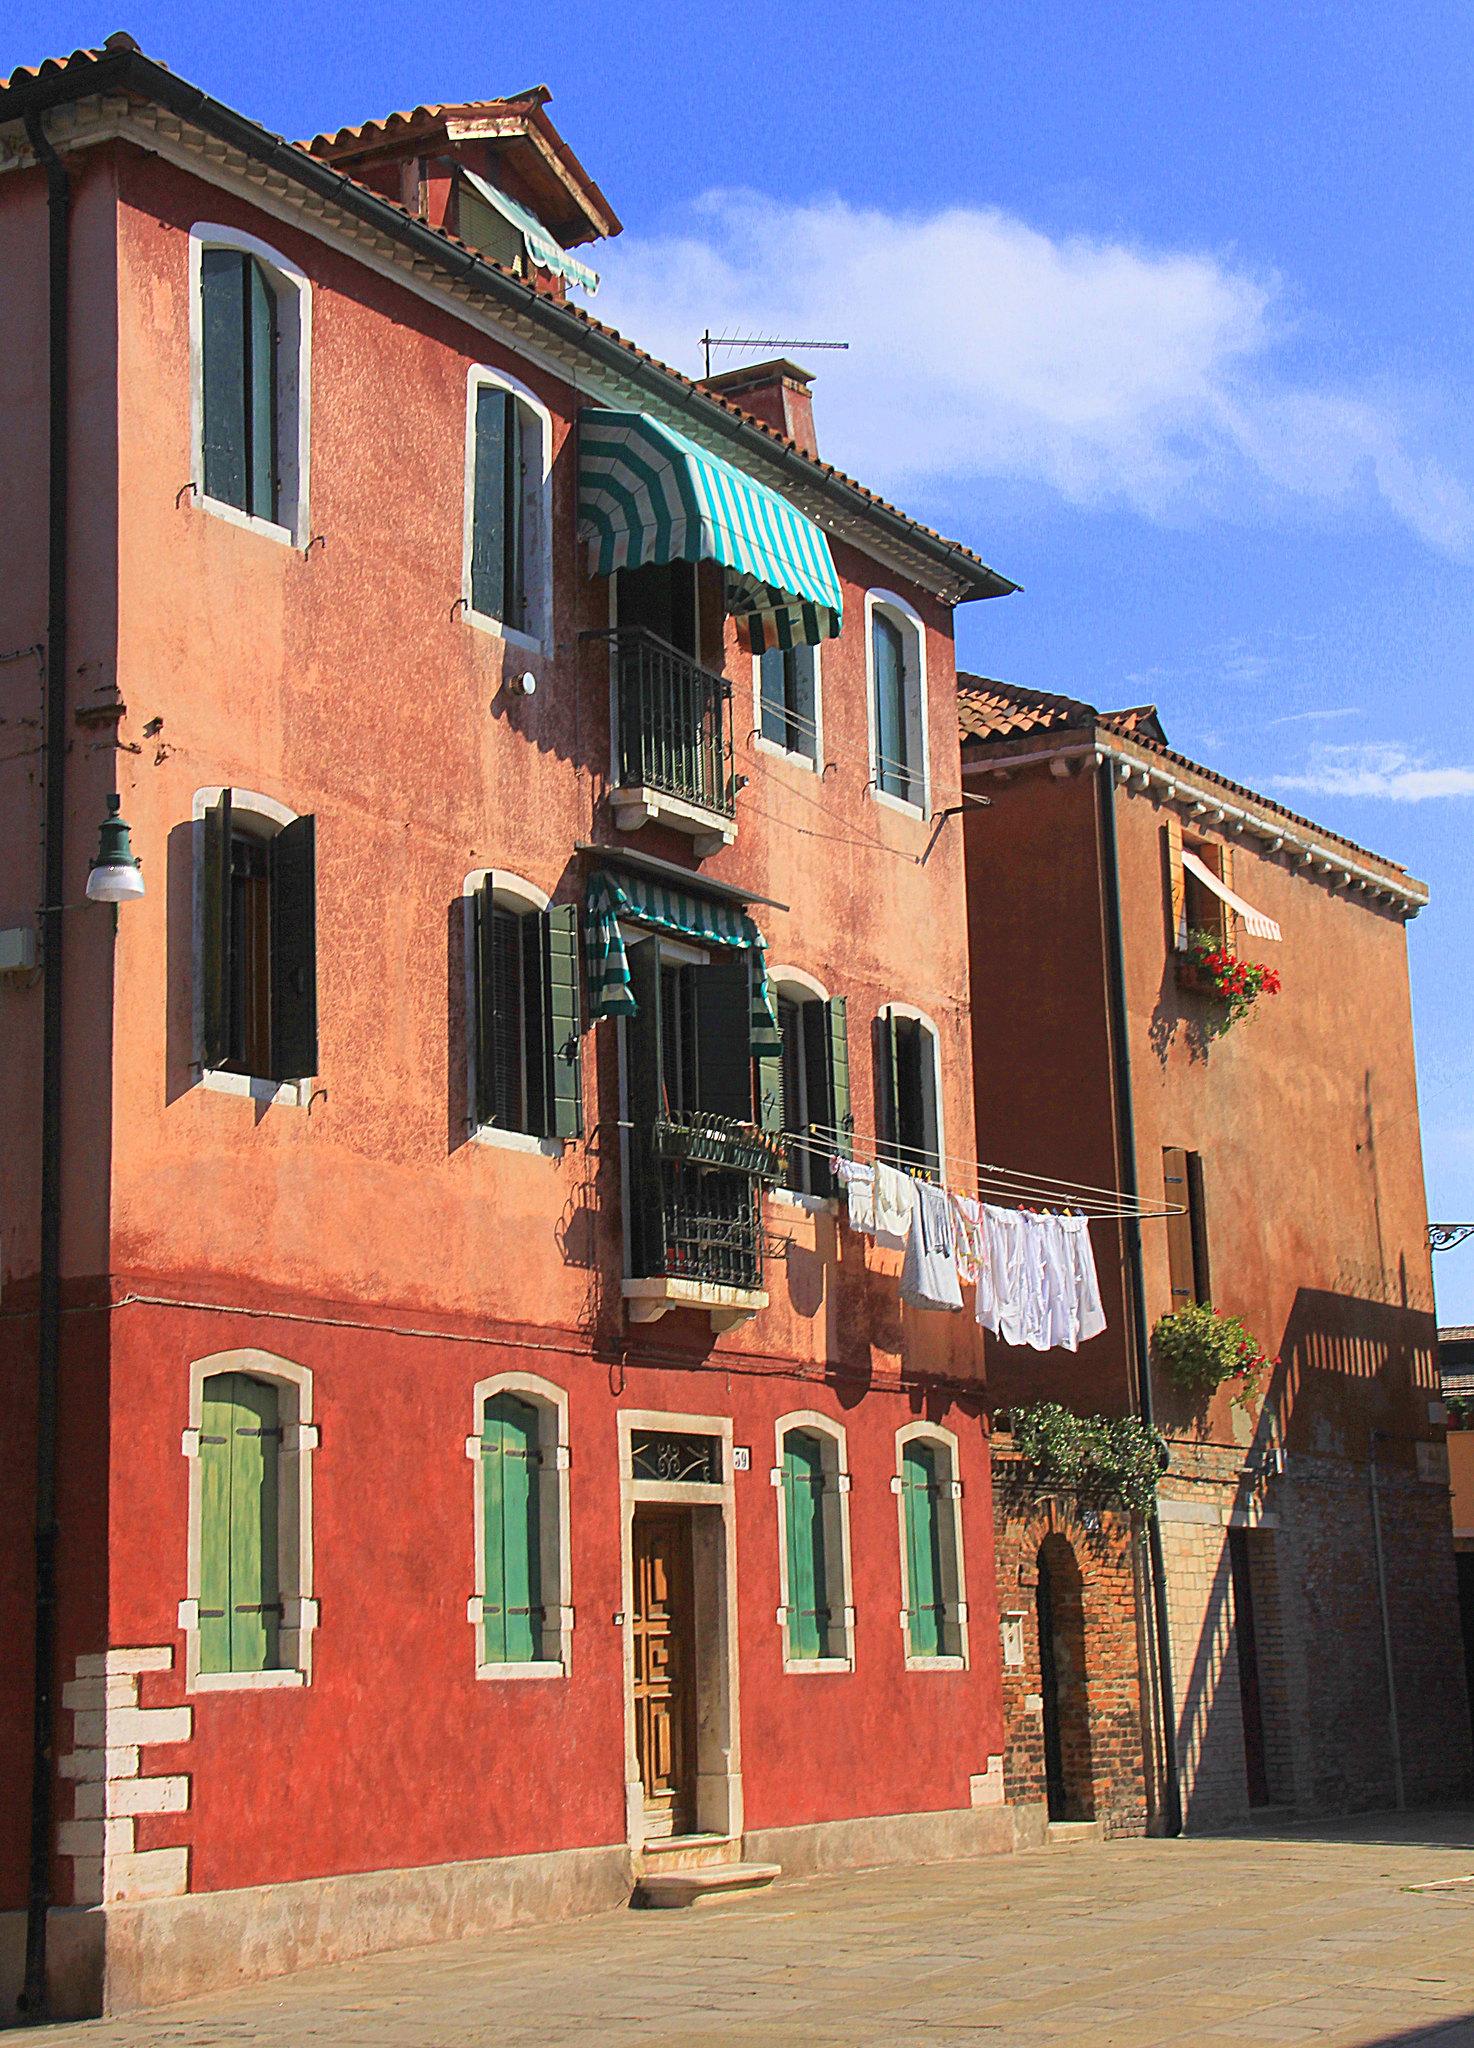 The small community of Murano